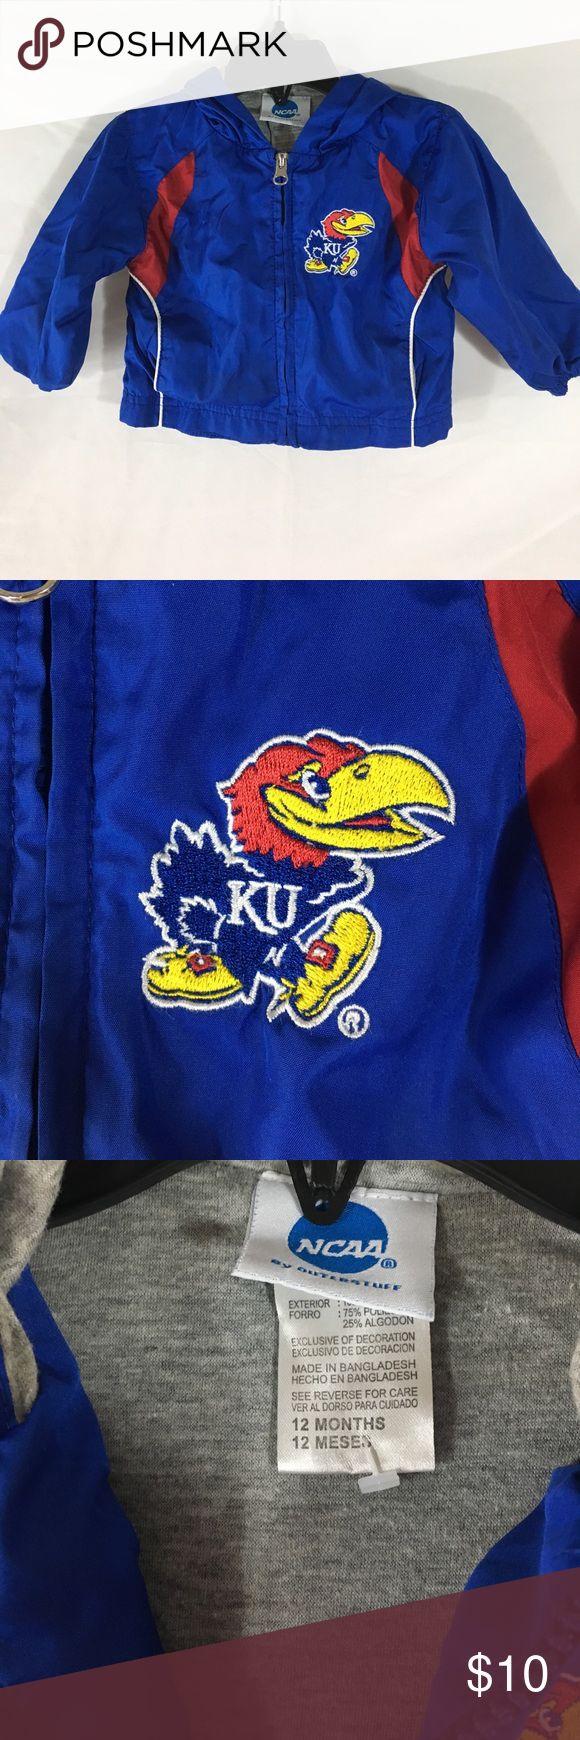 NCAA KU Blue and Red Windbreaker SZ 9/12 M NCAA KU Blue and Red Windbreaker SZ 9/12 M. Like new condition - no flaws!  Lined with soft gray liner and hood. So cute! NCAA Jackets & Coats Raincoats